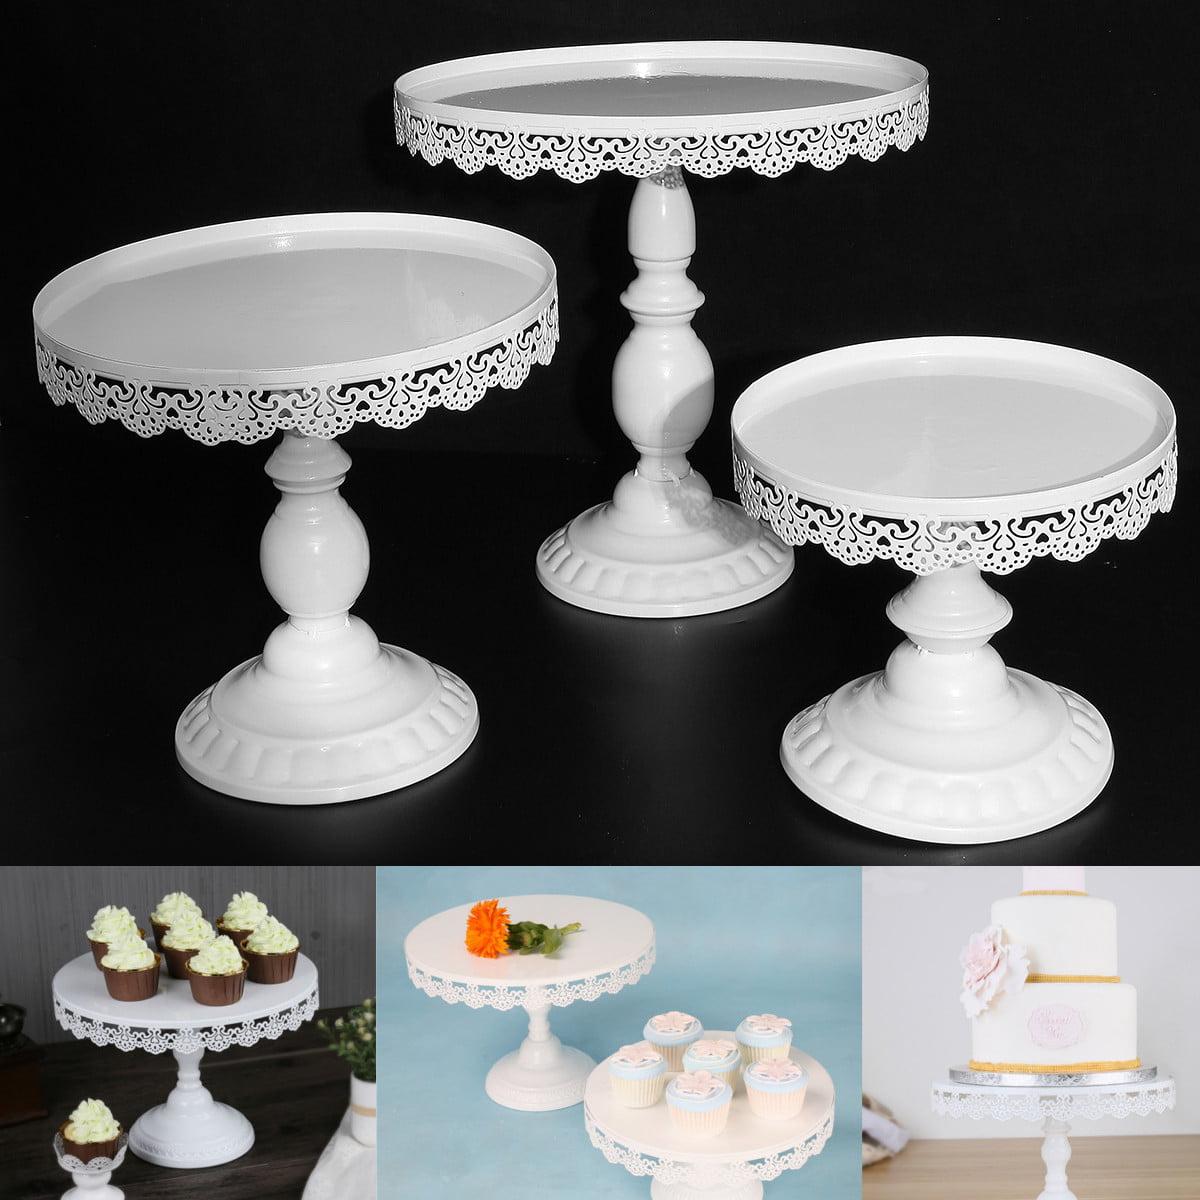 Vintage Round Cake Cupcake Stand Dessert Holder Fruit Display for Wedding Parties ,White